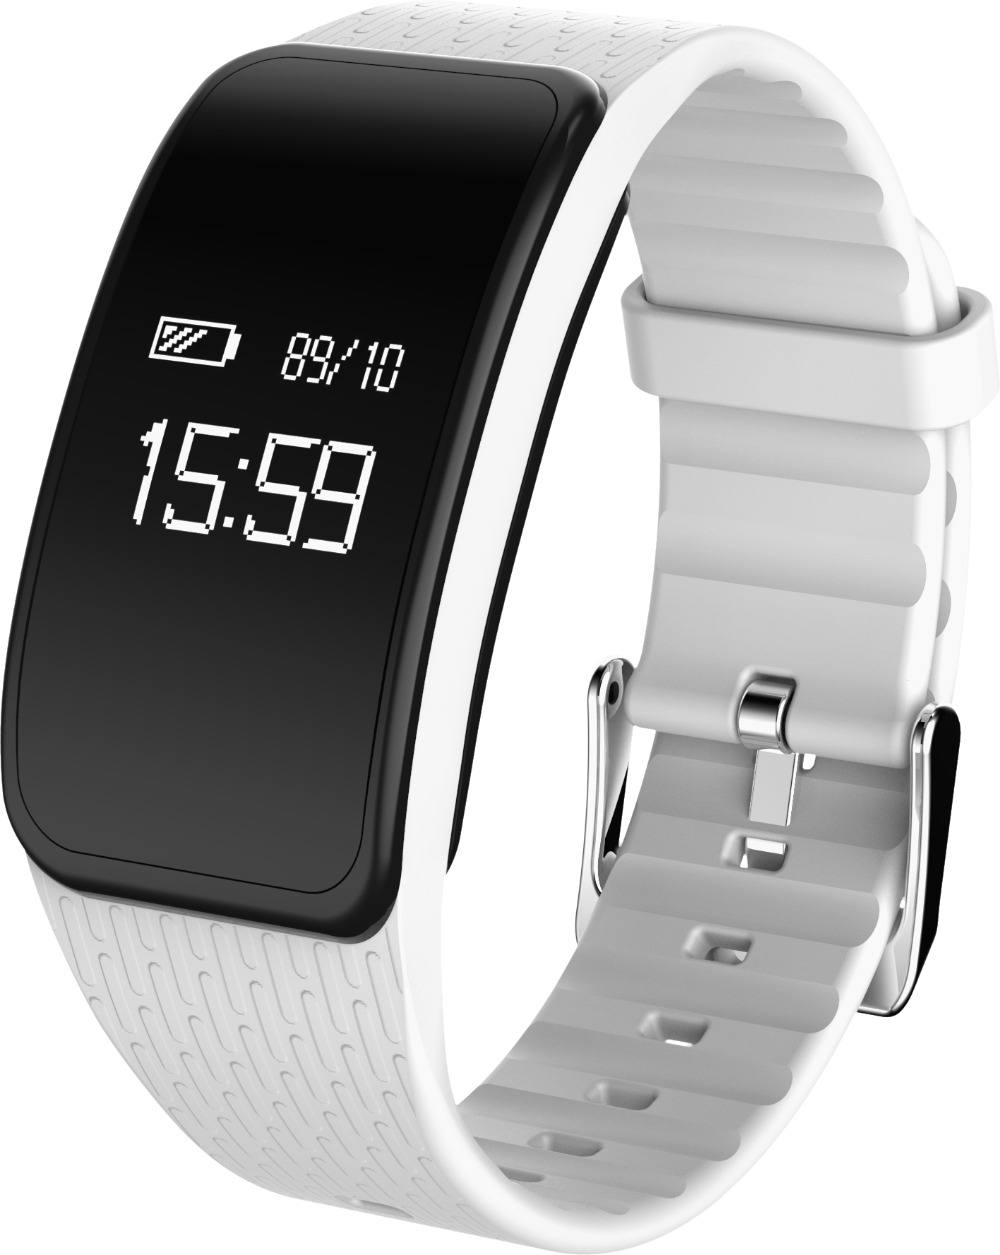 HAIOM New A59 Smart Bracelet Heart Rate Blood Oxygen Blood Pressure Fatigue WeChat Motion Trajectory Private Model Waterproof